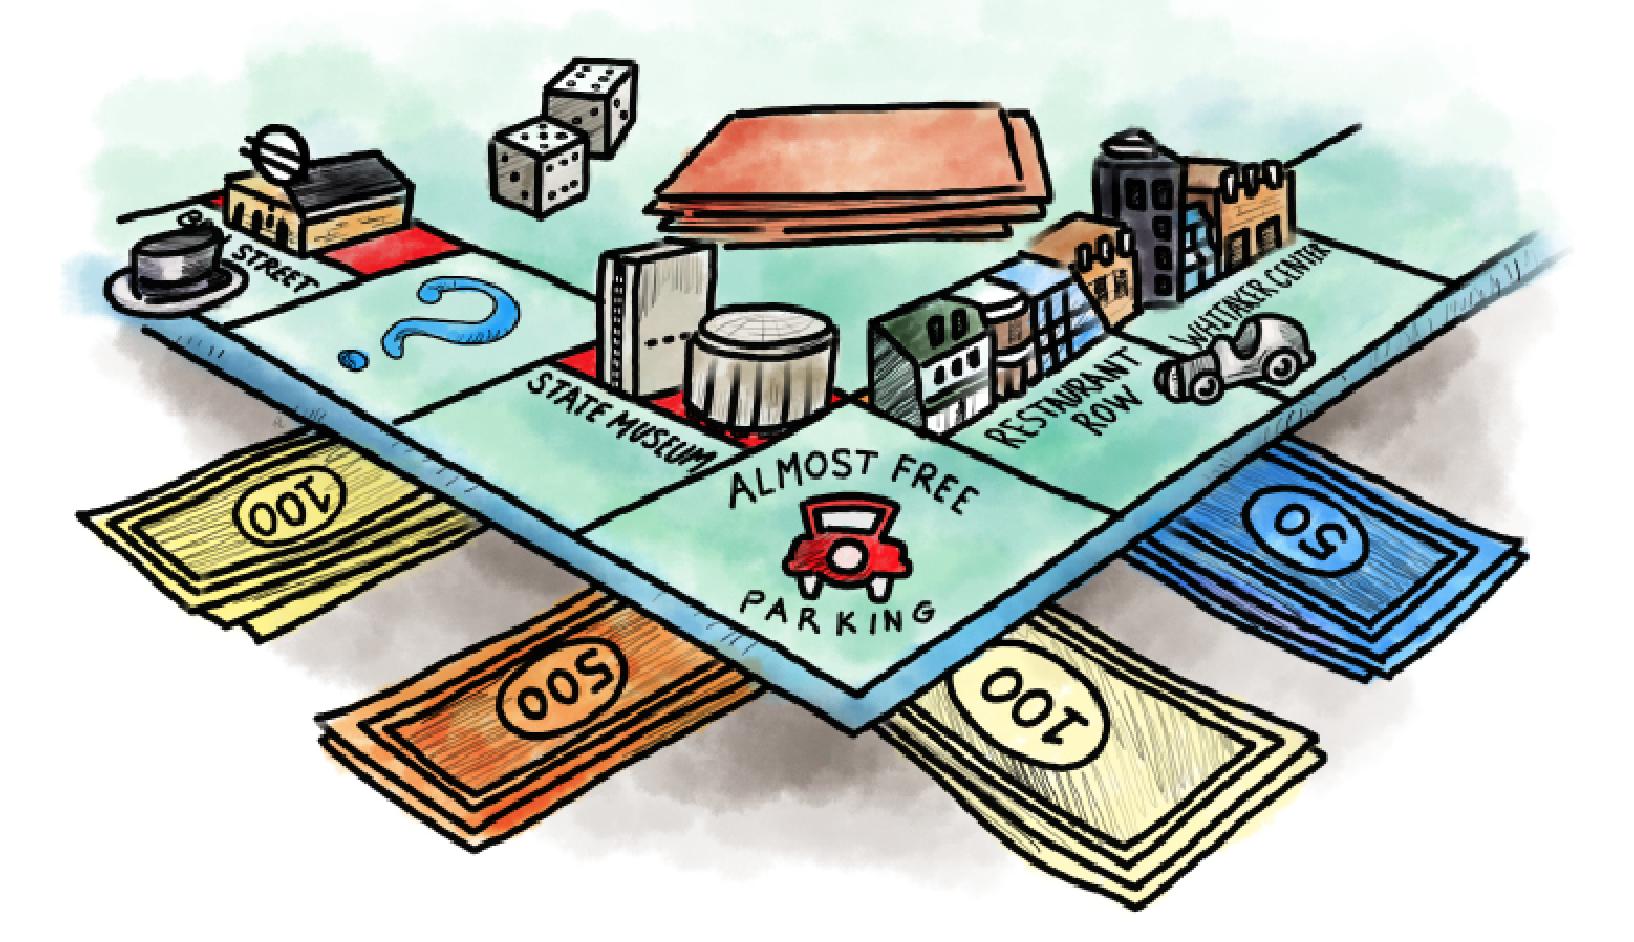 monopol gratis parkering